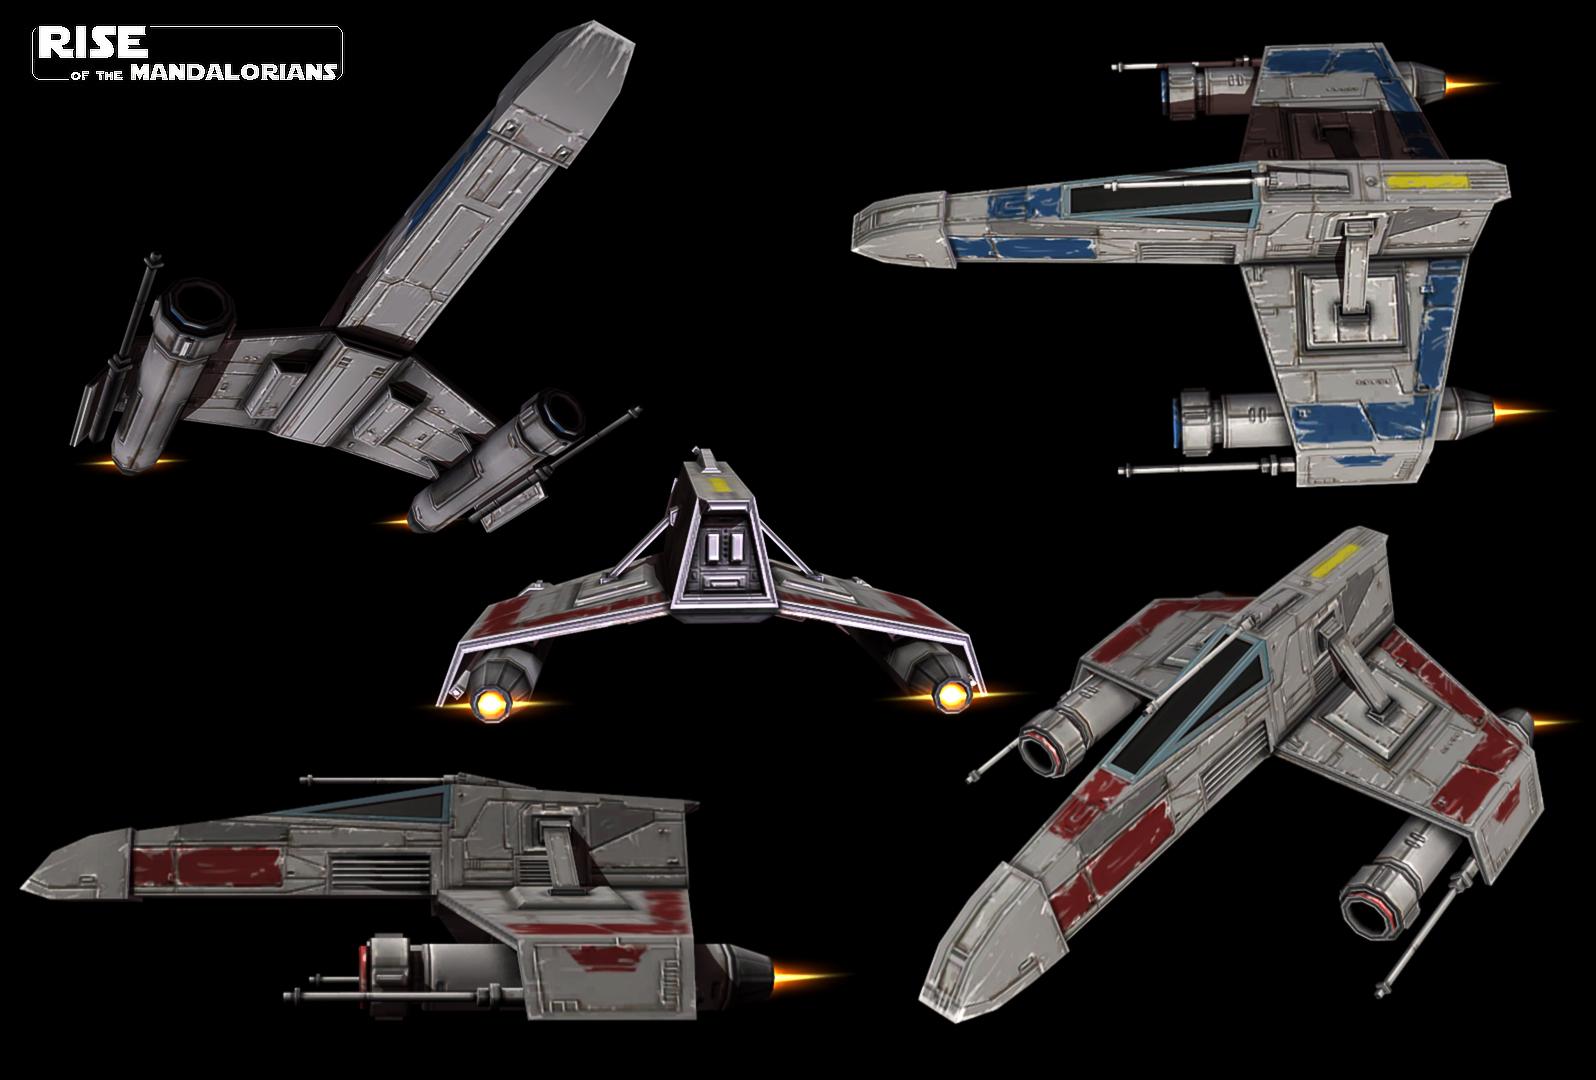 Star Wars E